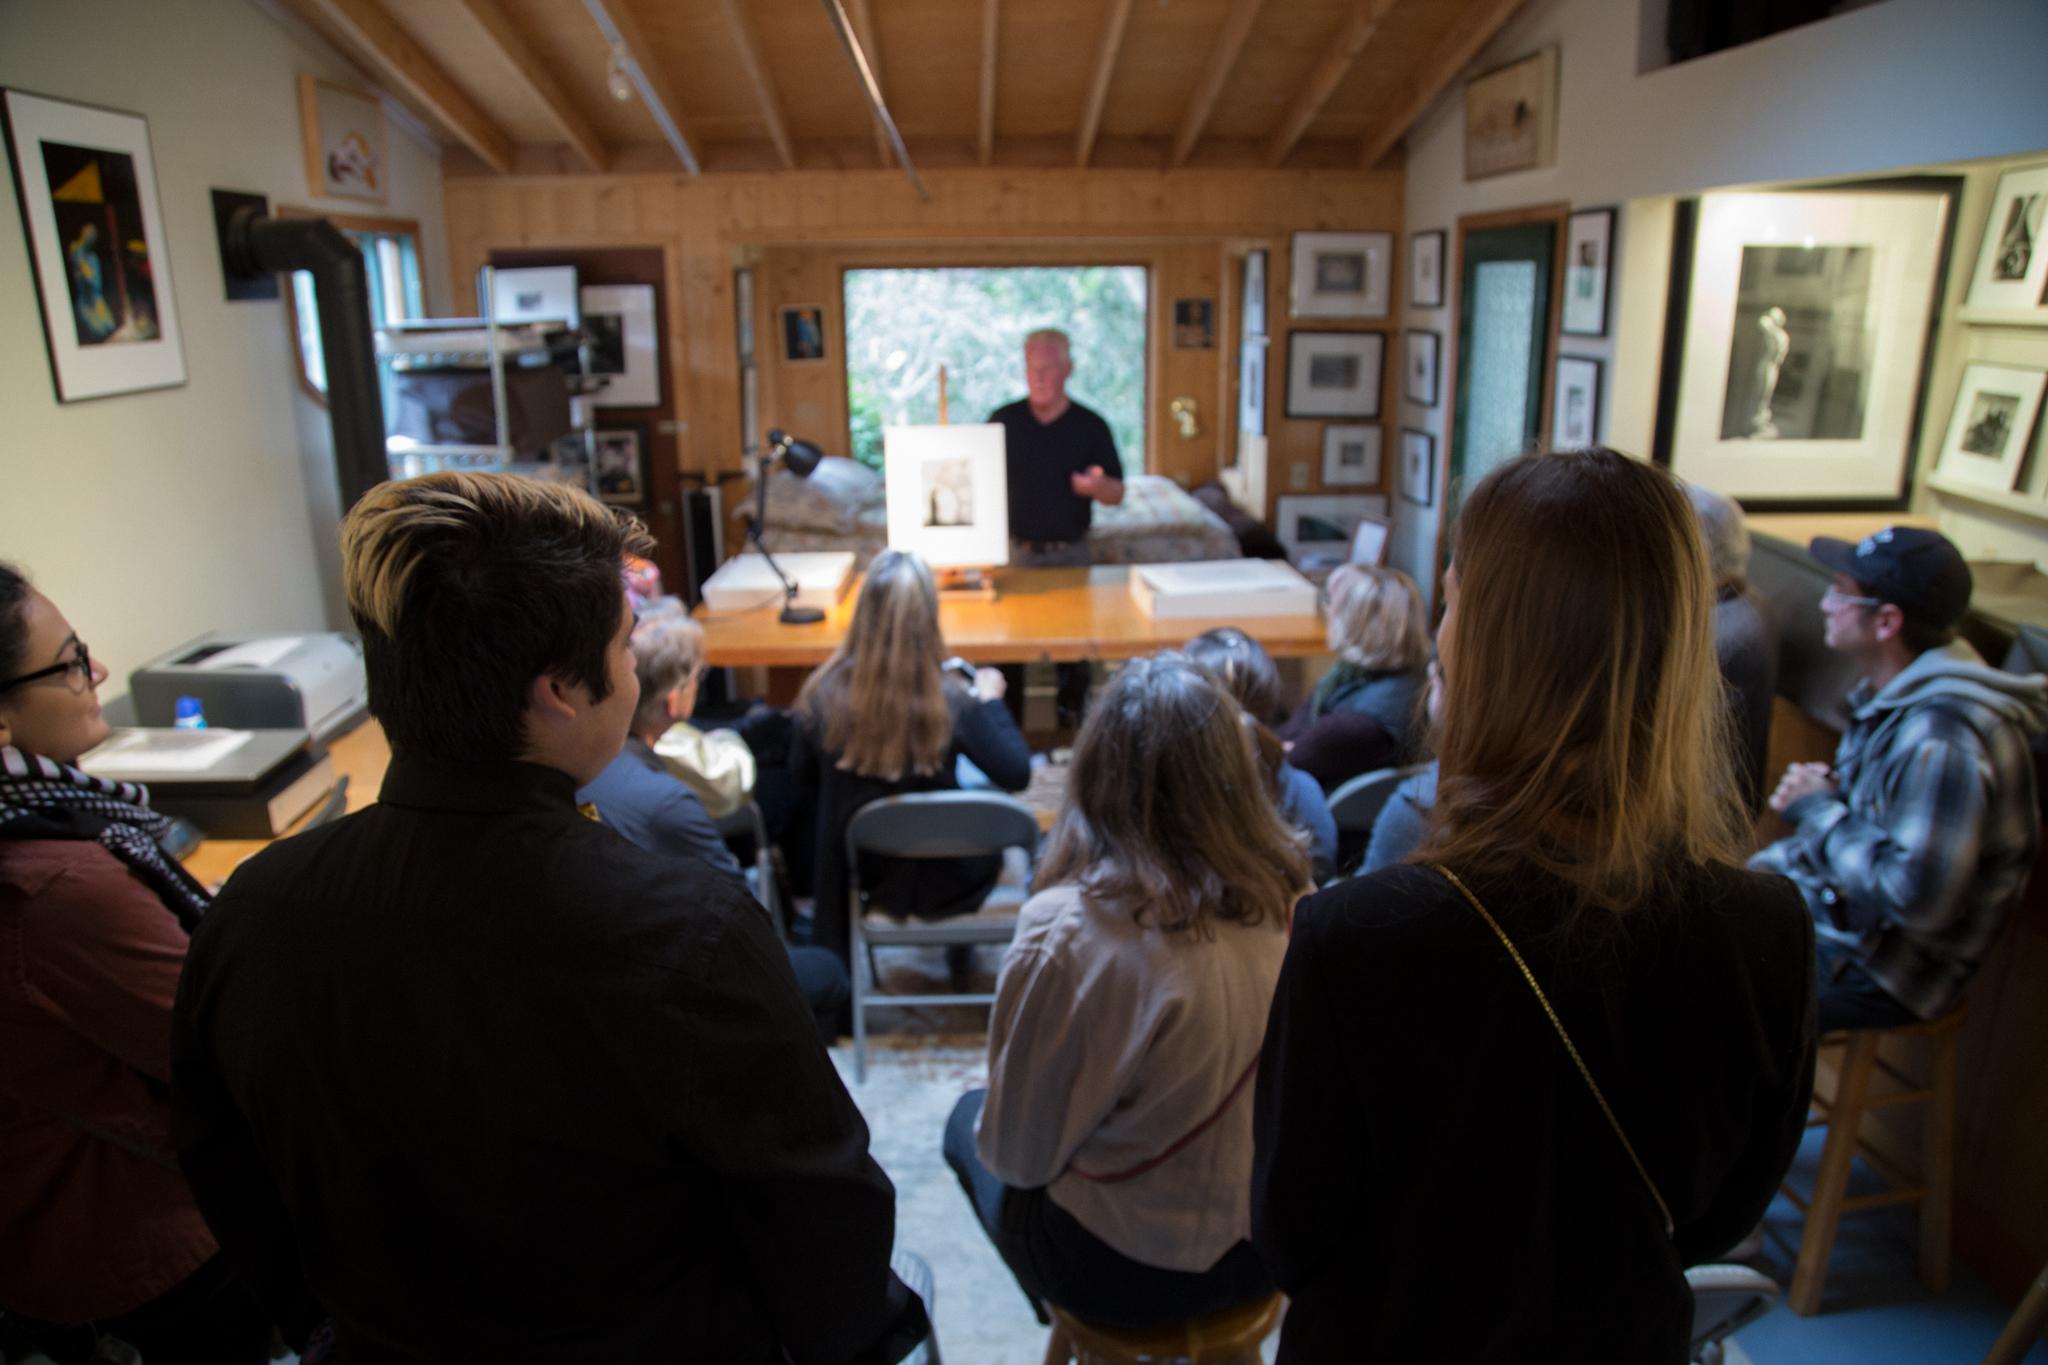 SJSU Photography Class Visit at Wildcat Hill